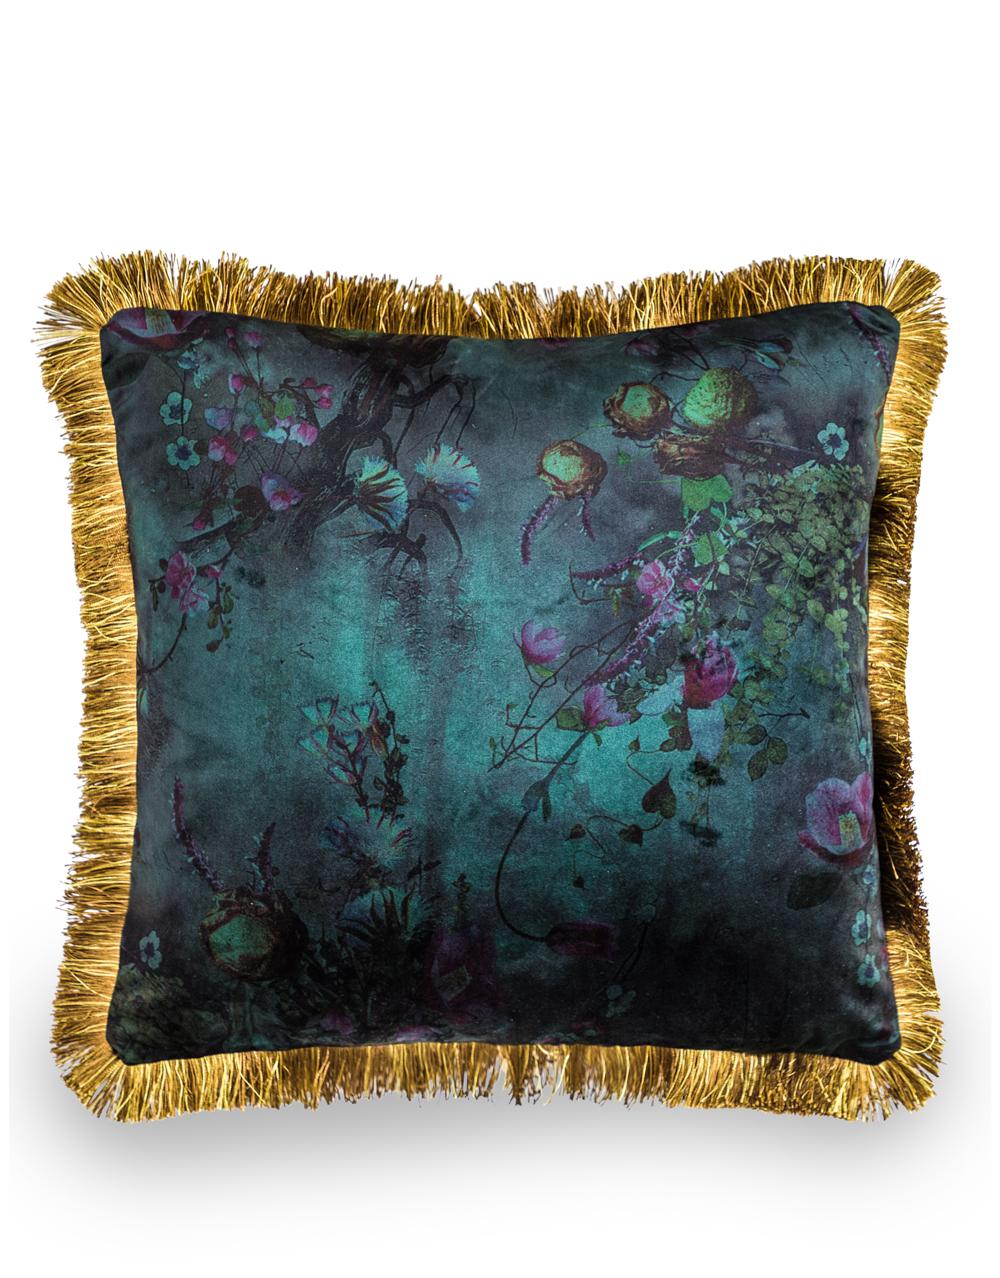 Boho Floral Velvet Dk Green Cushion with Gold Fringe Detail